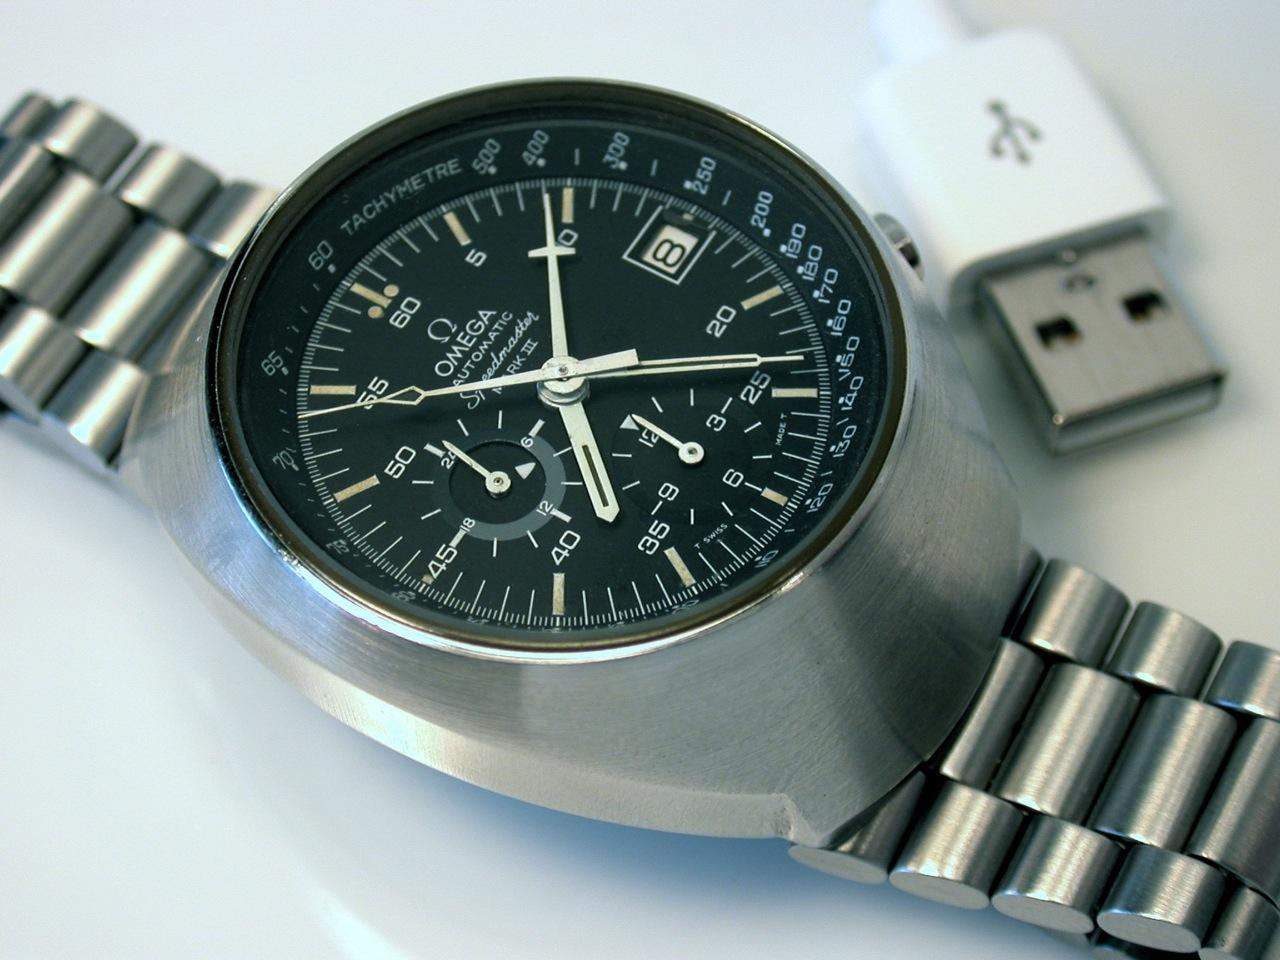 Omega Uhren Gebraucht Ebay